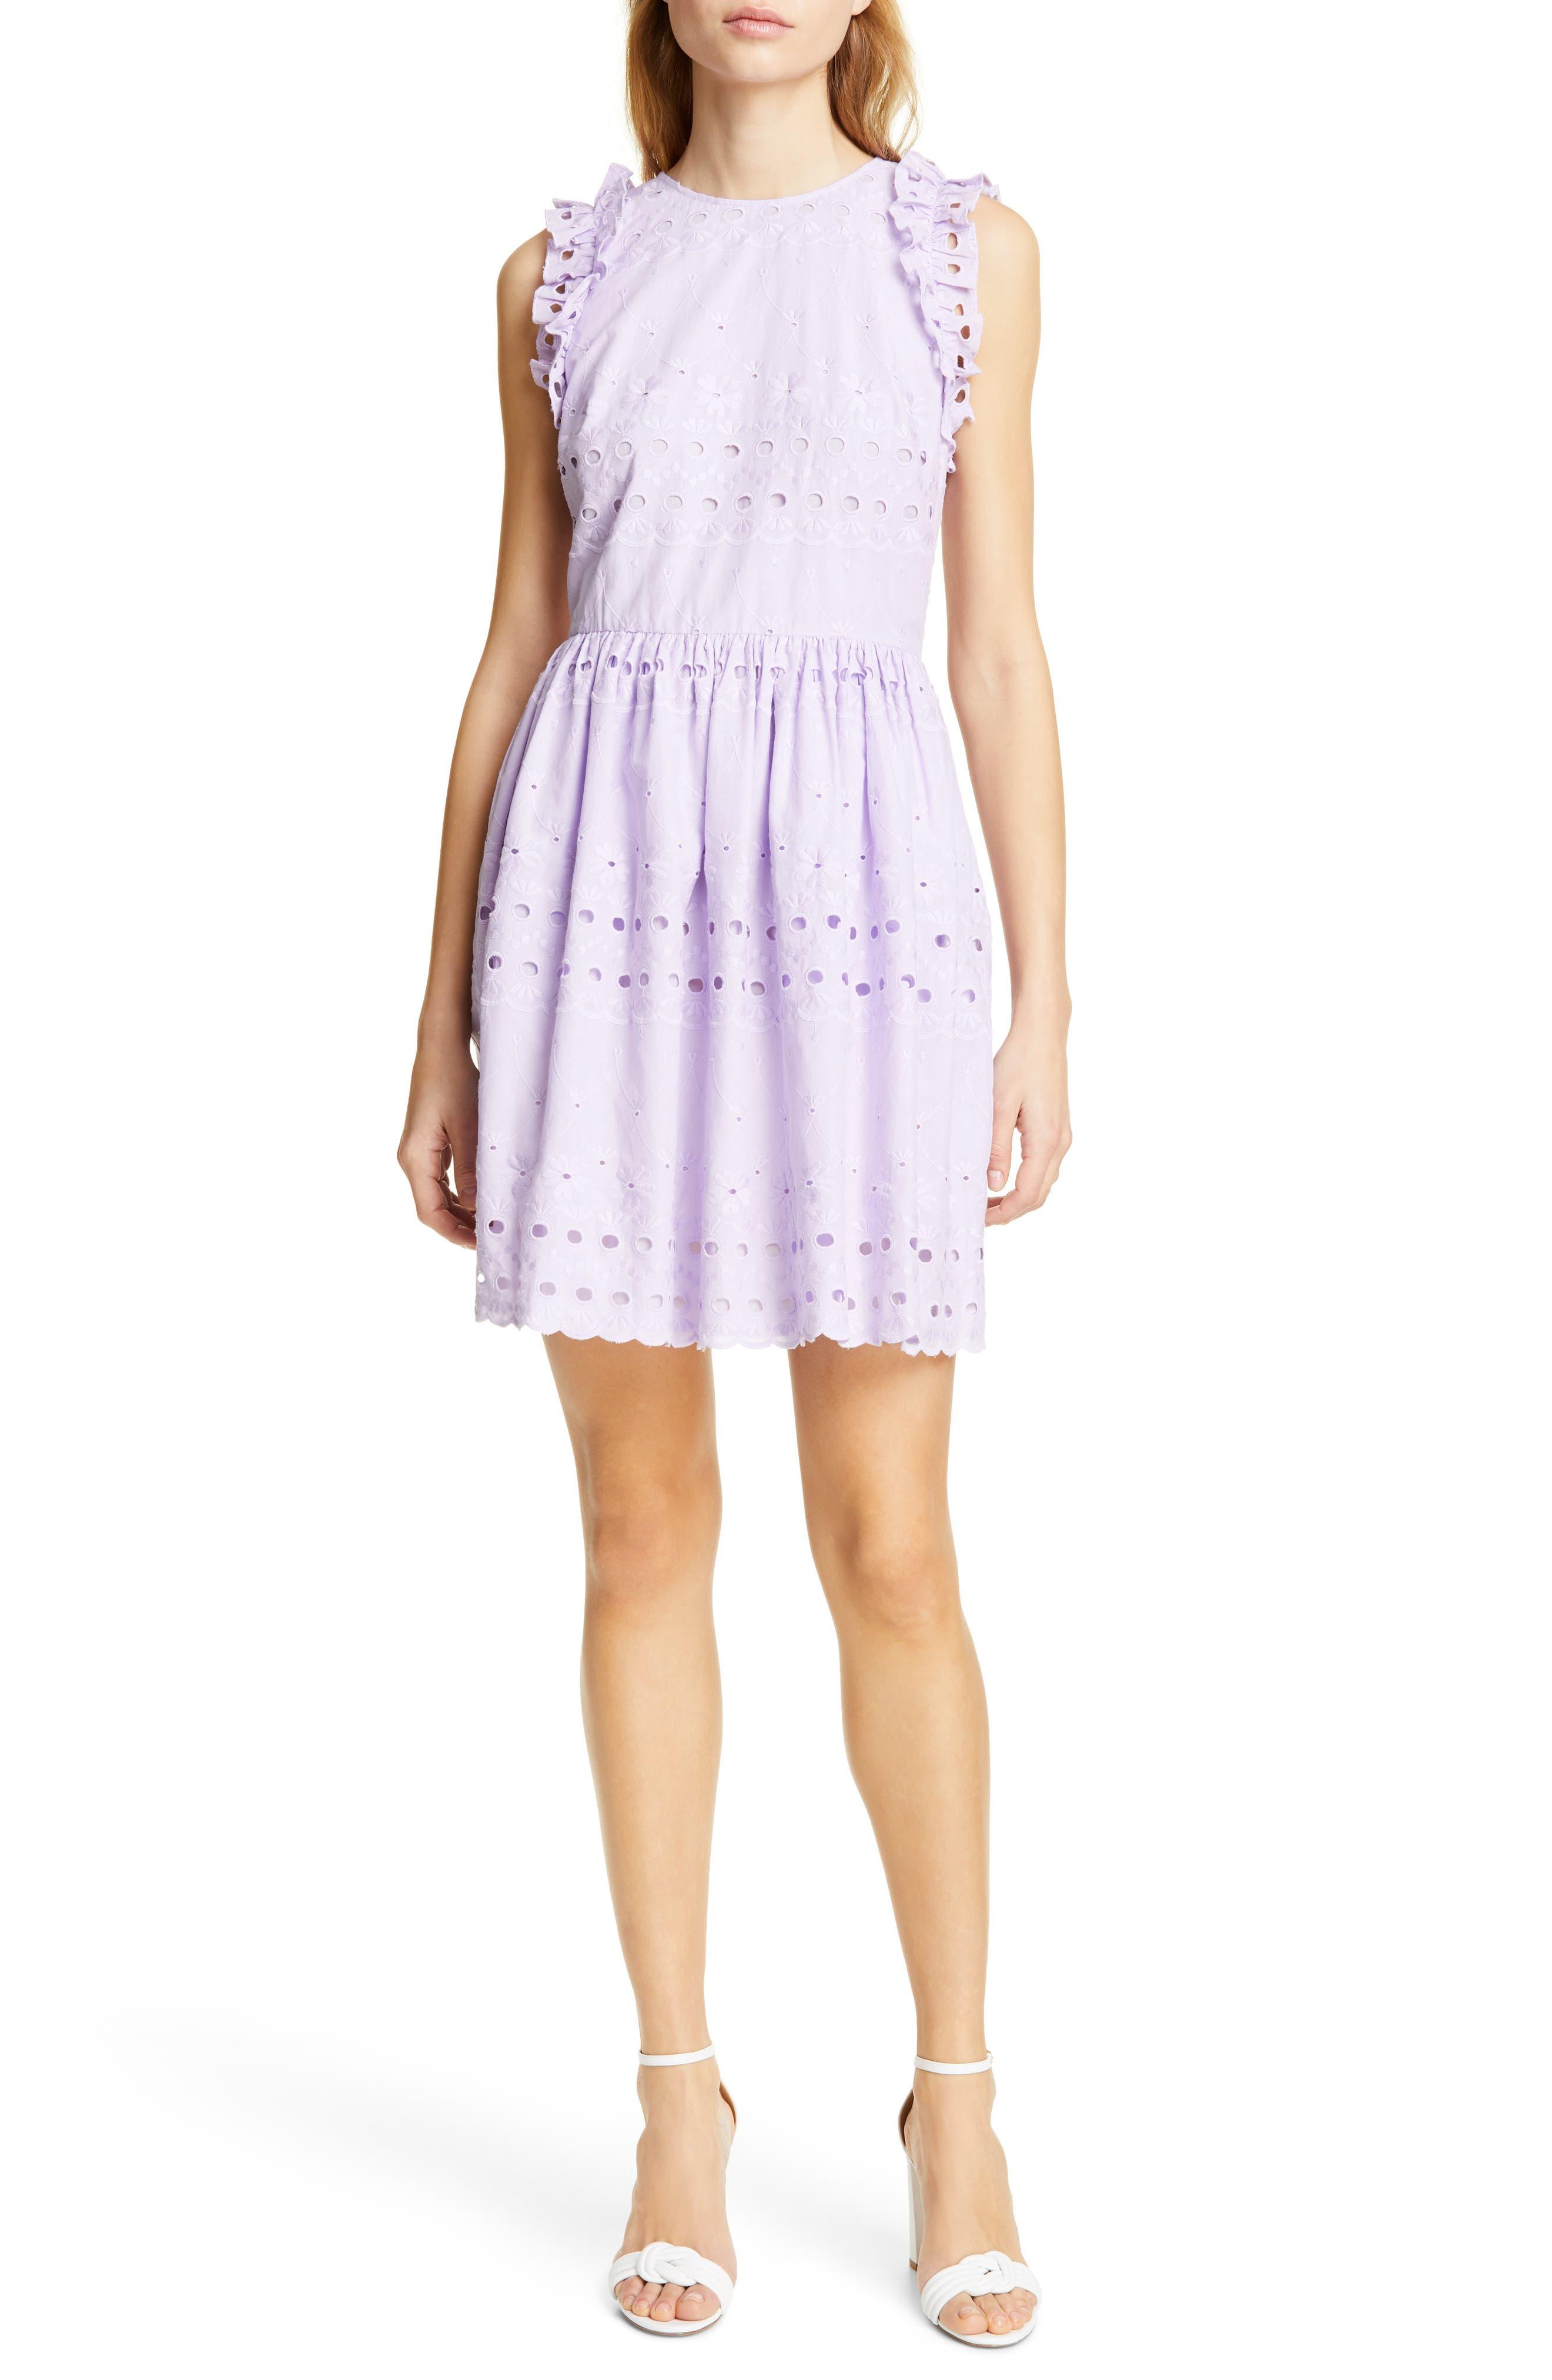 Kate Spade New York Eyelet Fit & Flare Dress, Purple